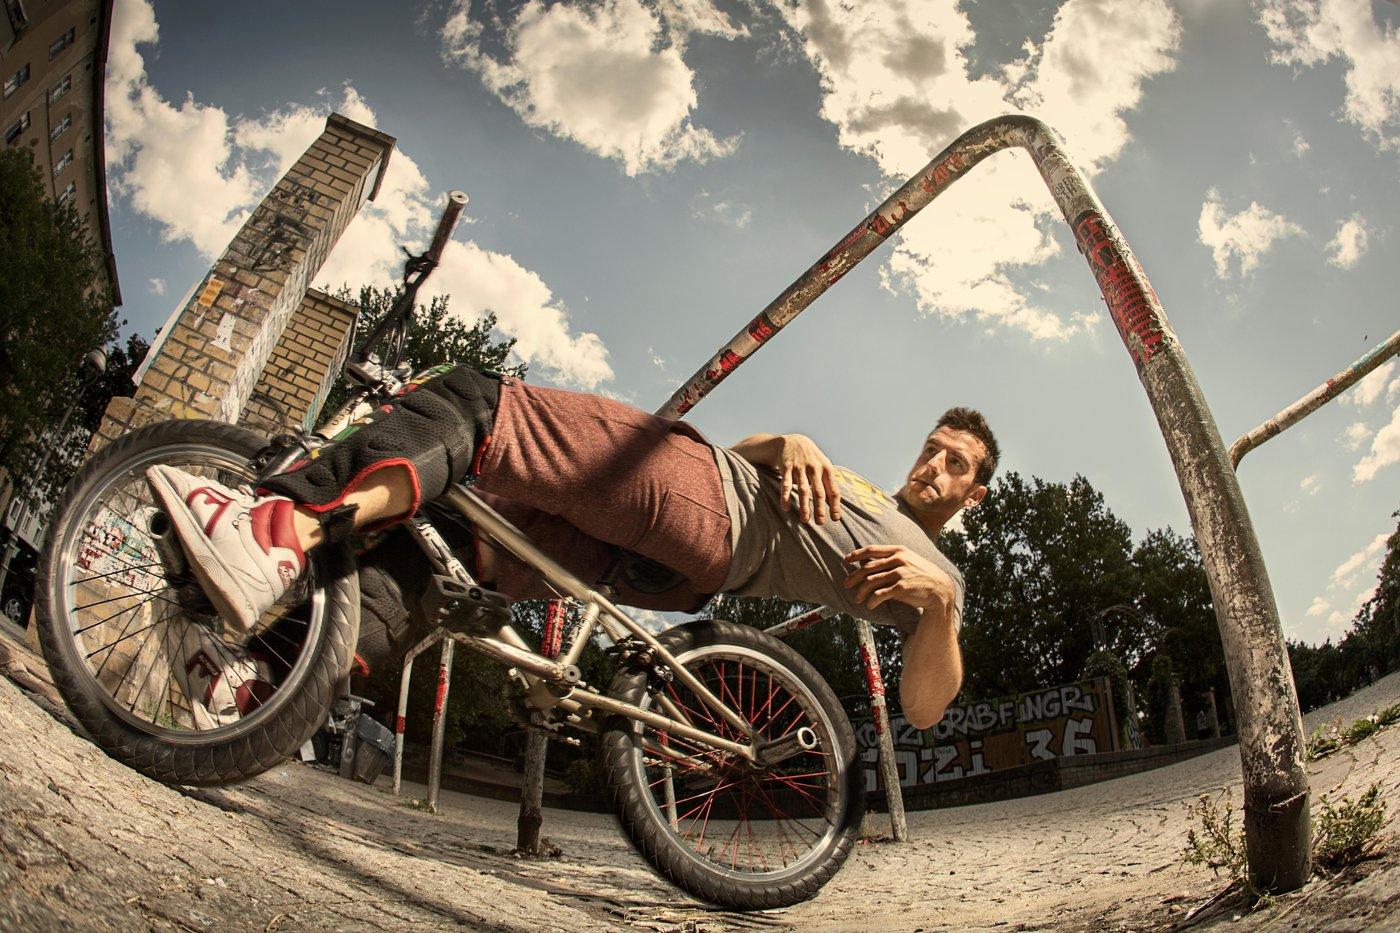 BMX Meets Parkour In Mindblowing Series Of Bike Tricks